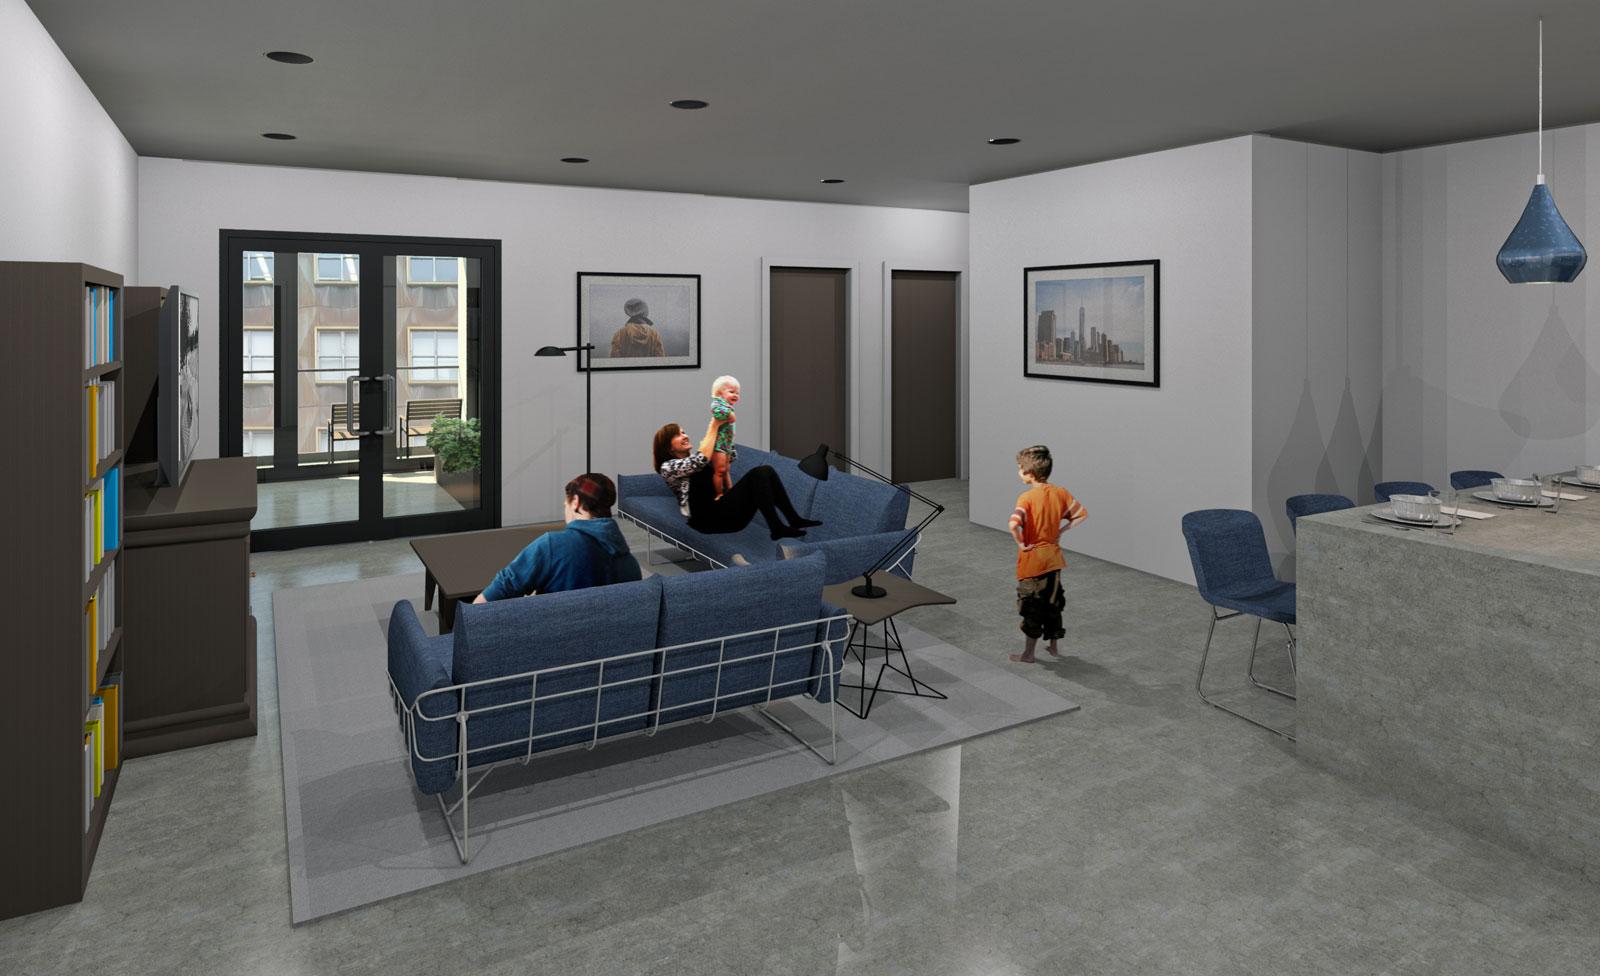 2 Bedroom Interior Post Processed 04